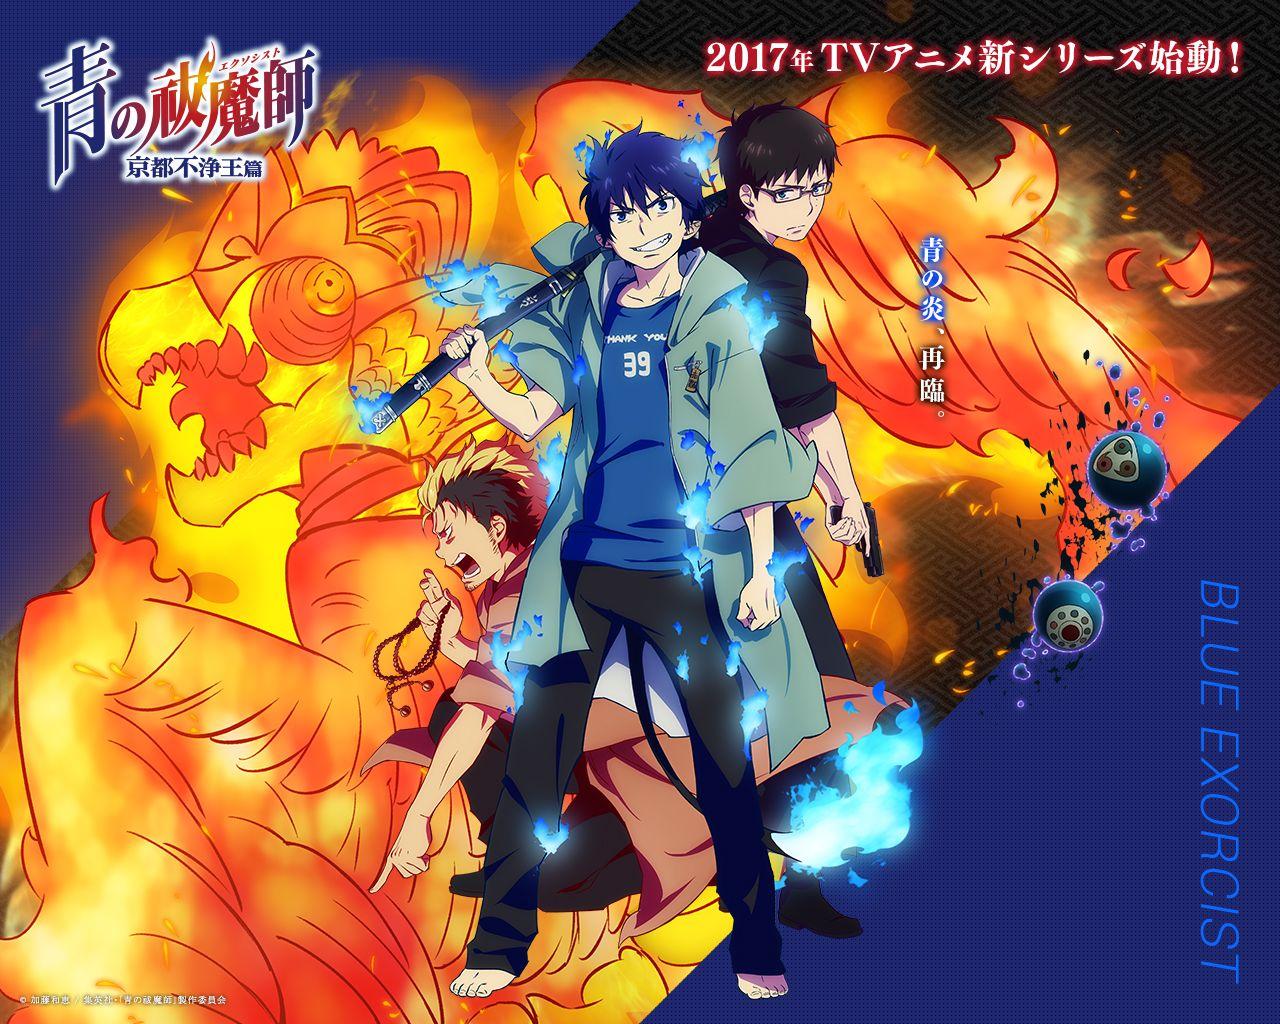 Hiroaki Hirata reemplazará a Keiji Fujiwara en el Anime Ao